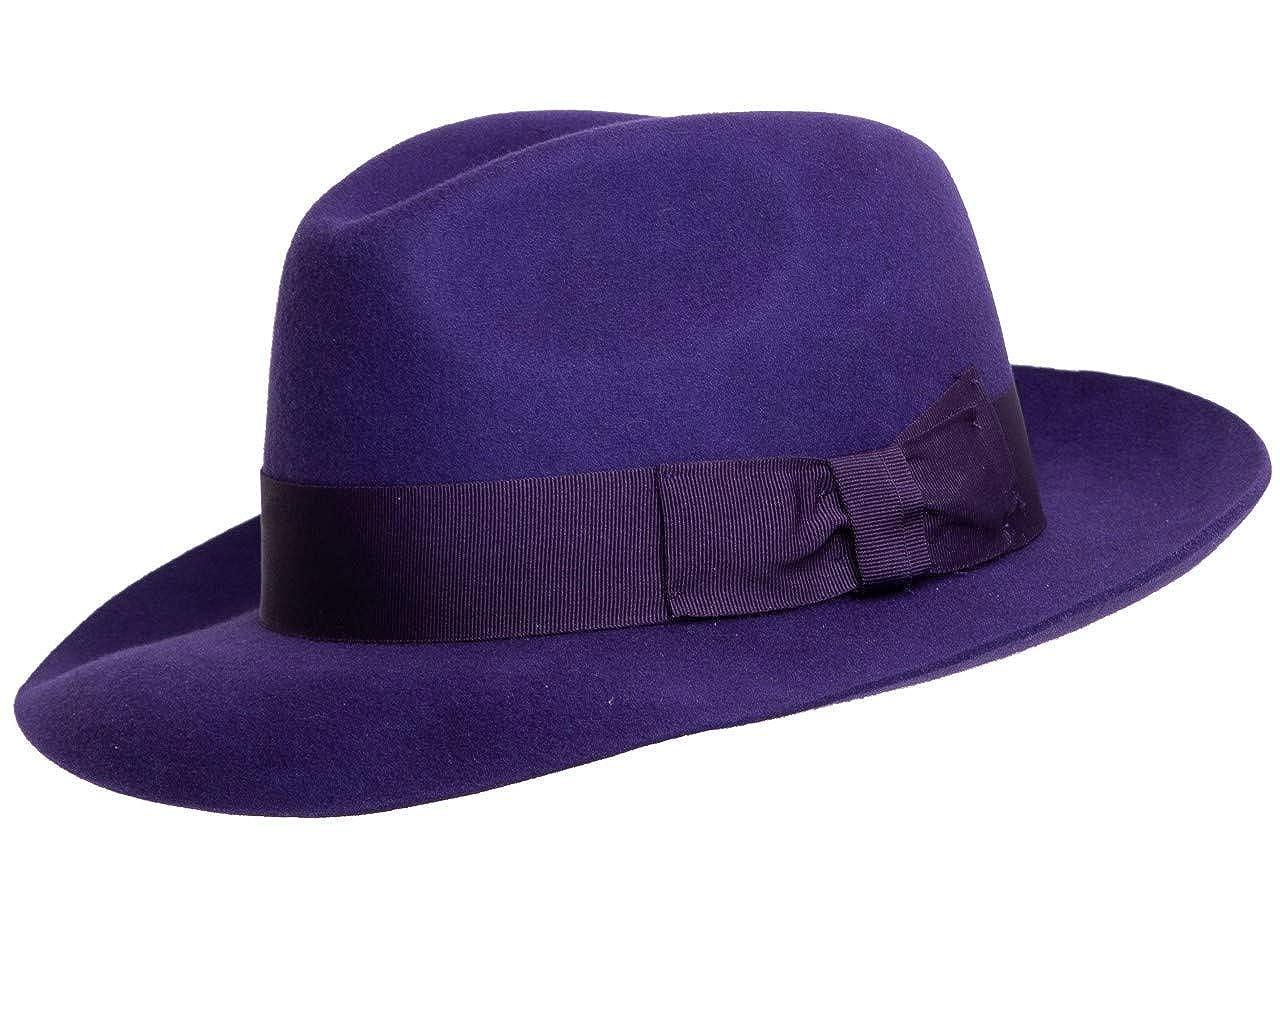 Purple Hand Made Gents Fedora Felt Trilby Hat with Wider Brim 100% Wool New